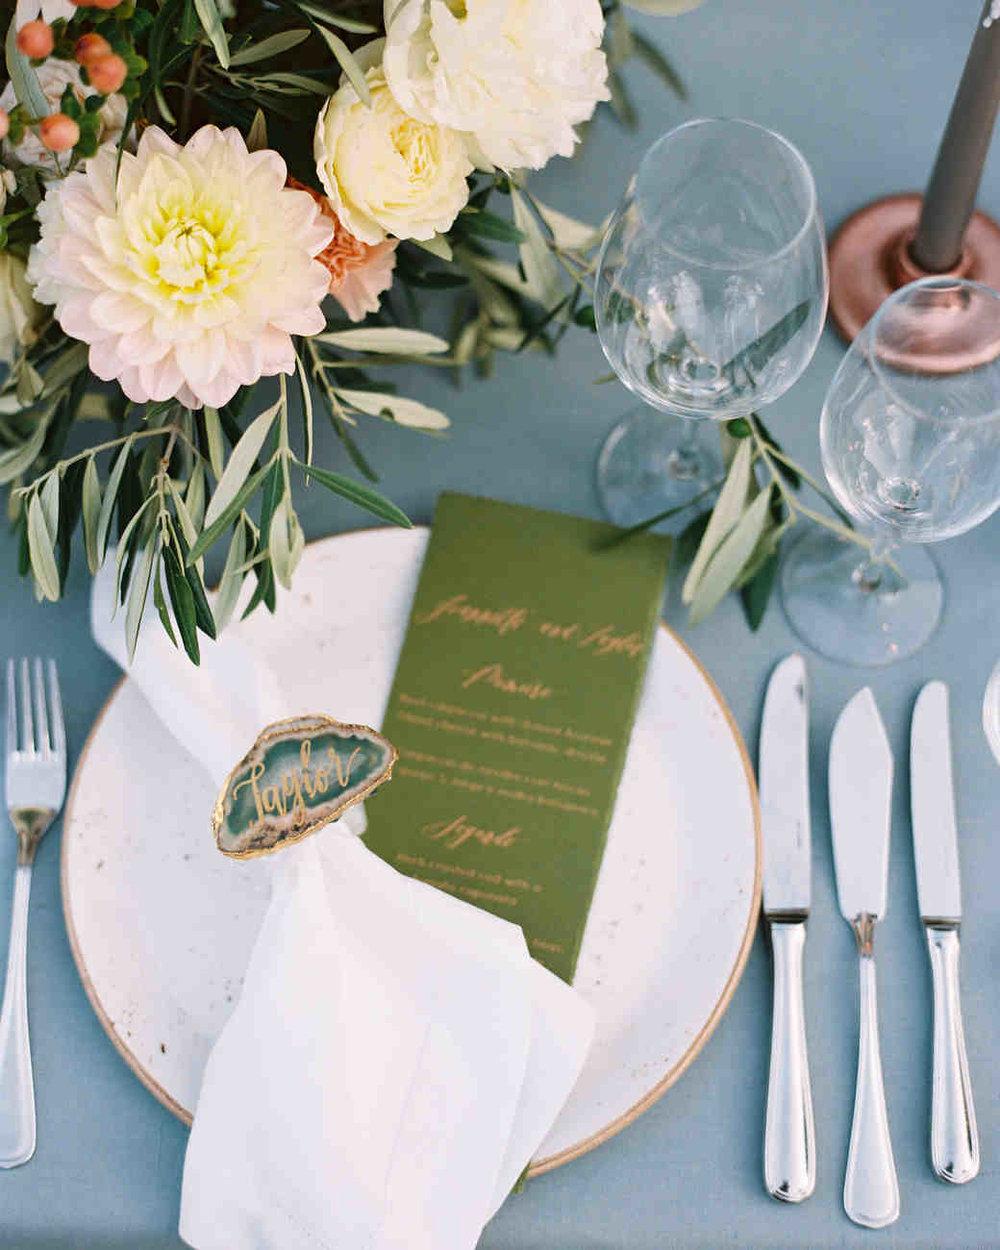 jeannette-taylor-wedding-portugal-menu-103115724_vert.jpg